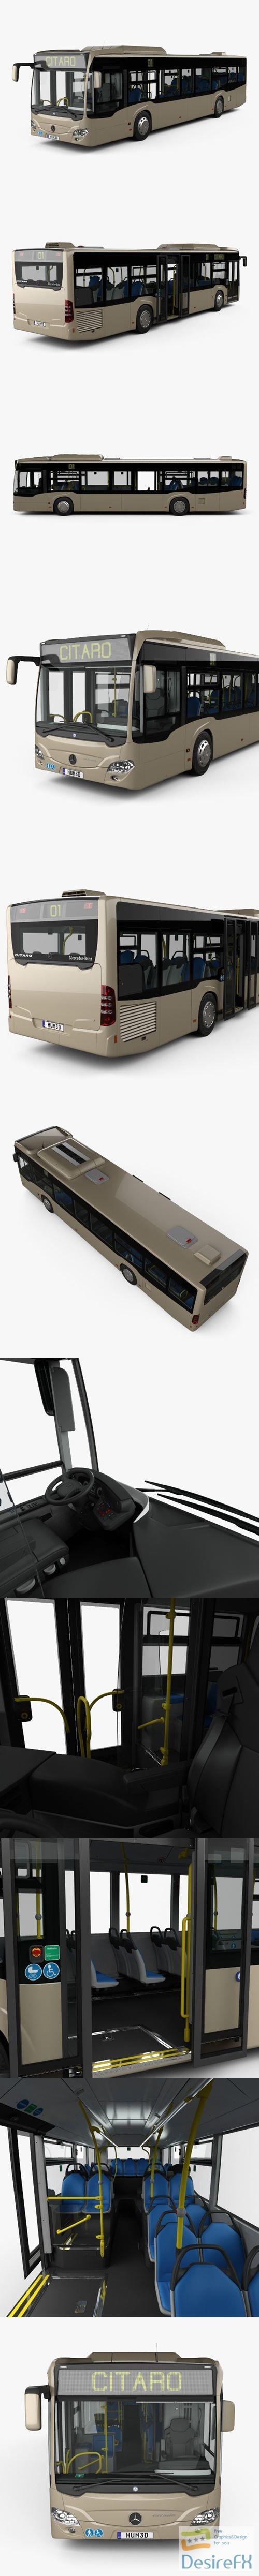 Mercedes-Benz Citaro O530 Bus with HQ interior 2011 3D Model